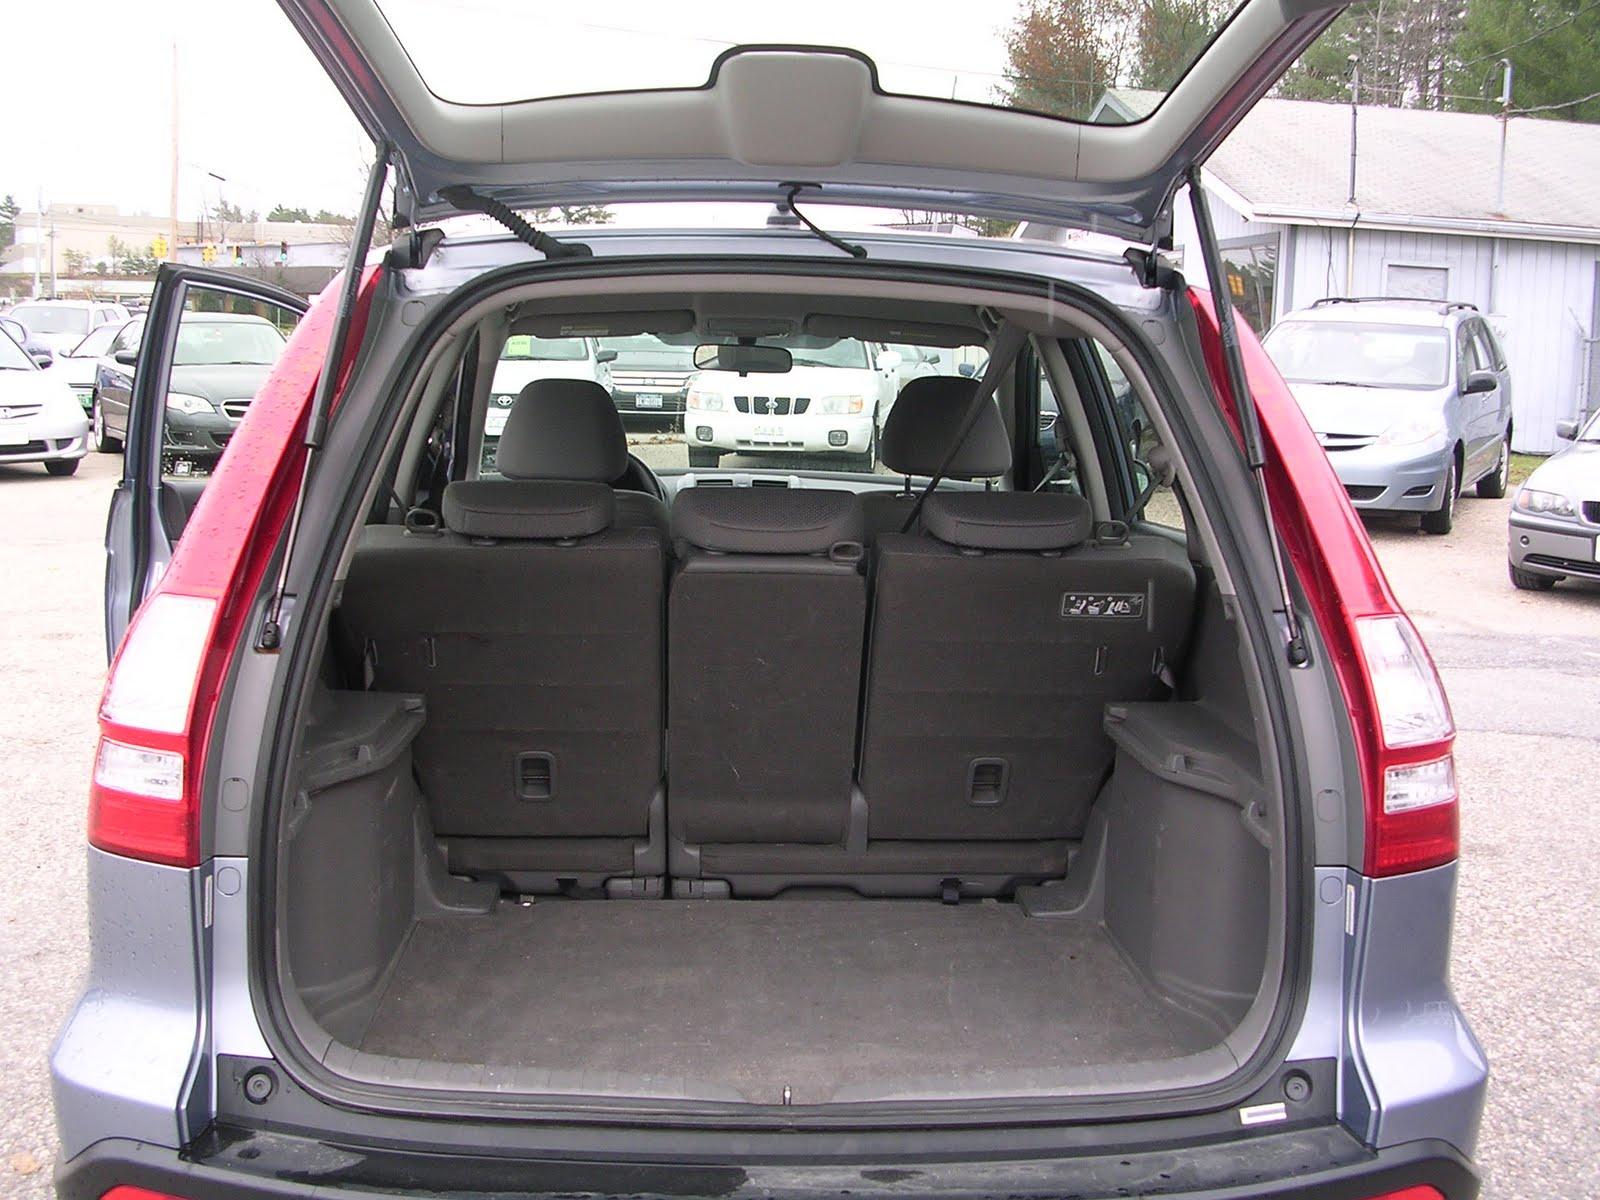 Safety features aol autos http autos aol com cars honda cr_v 2008 lx__4x4 safety features